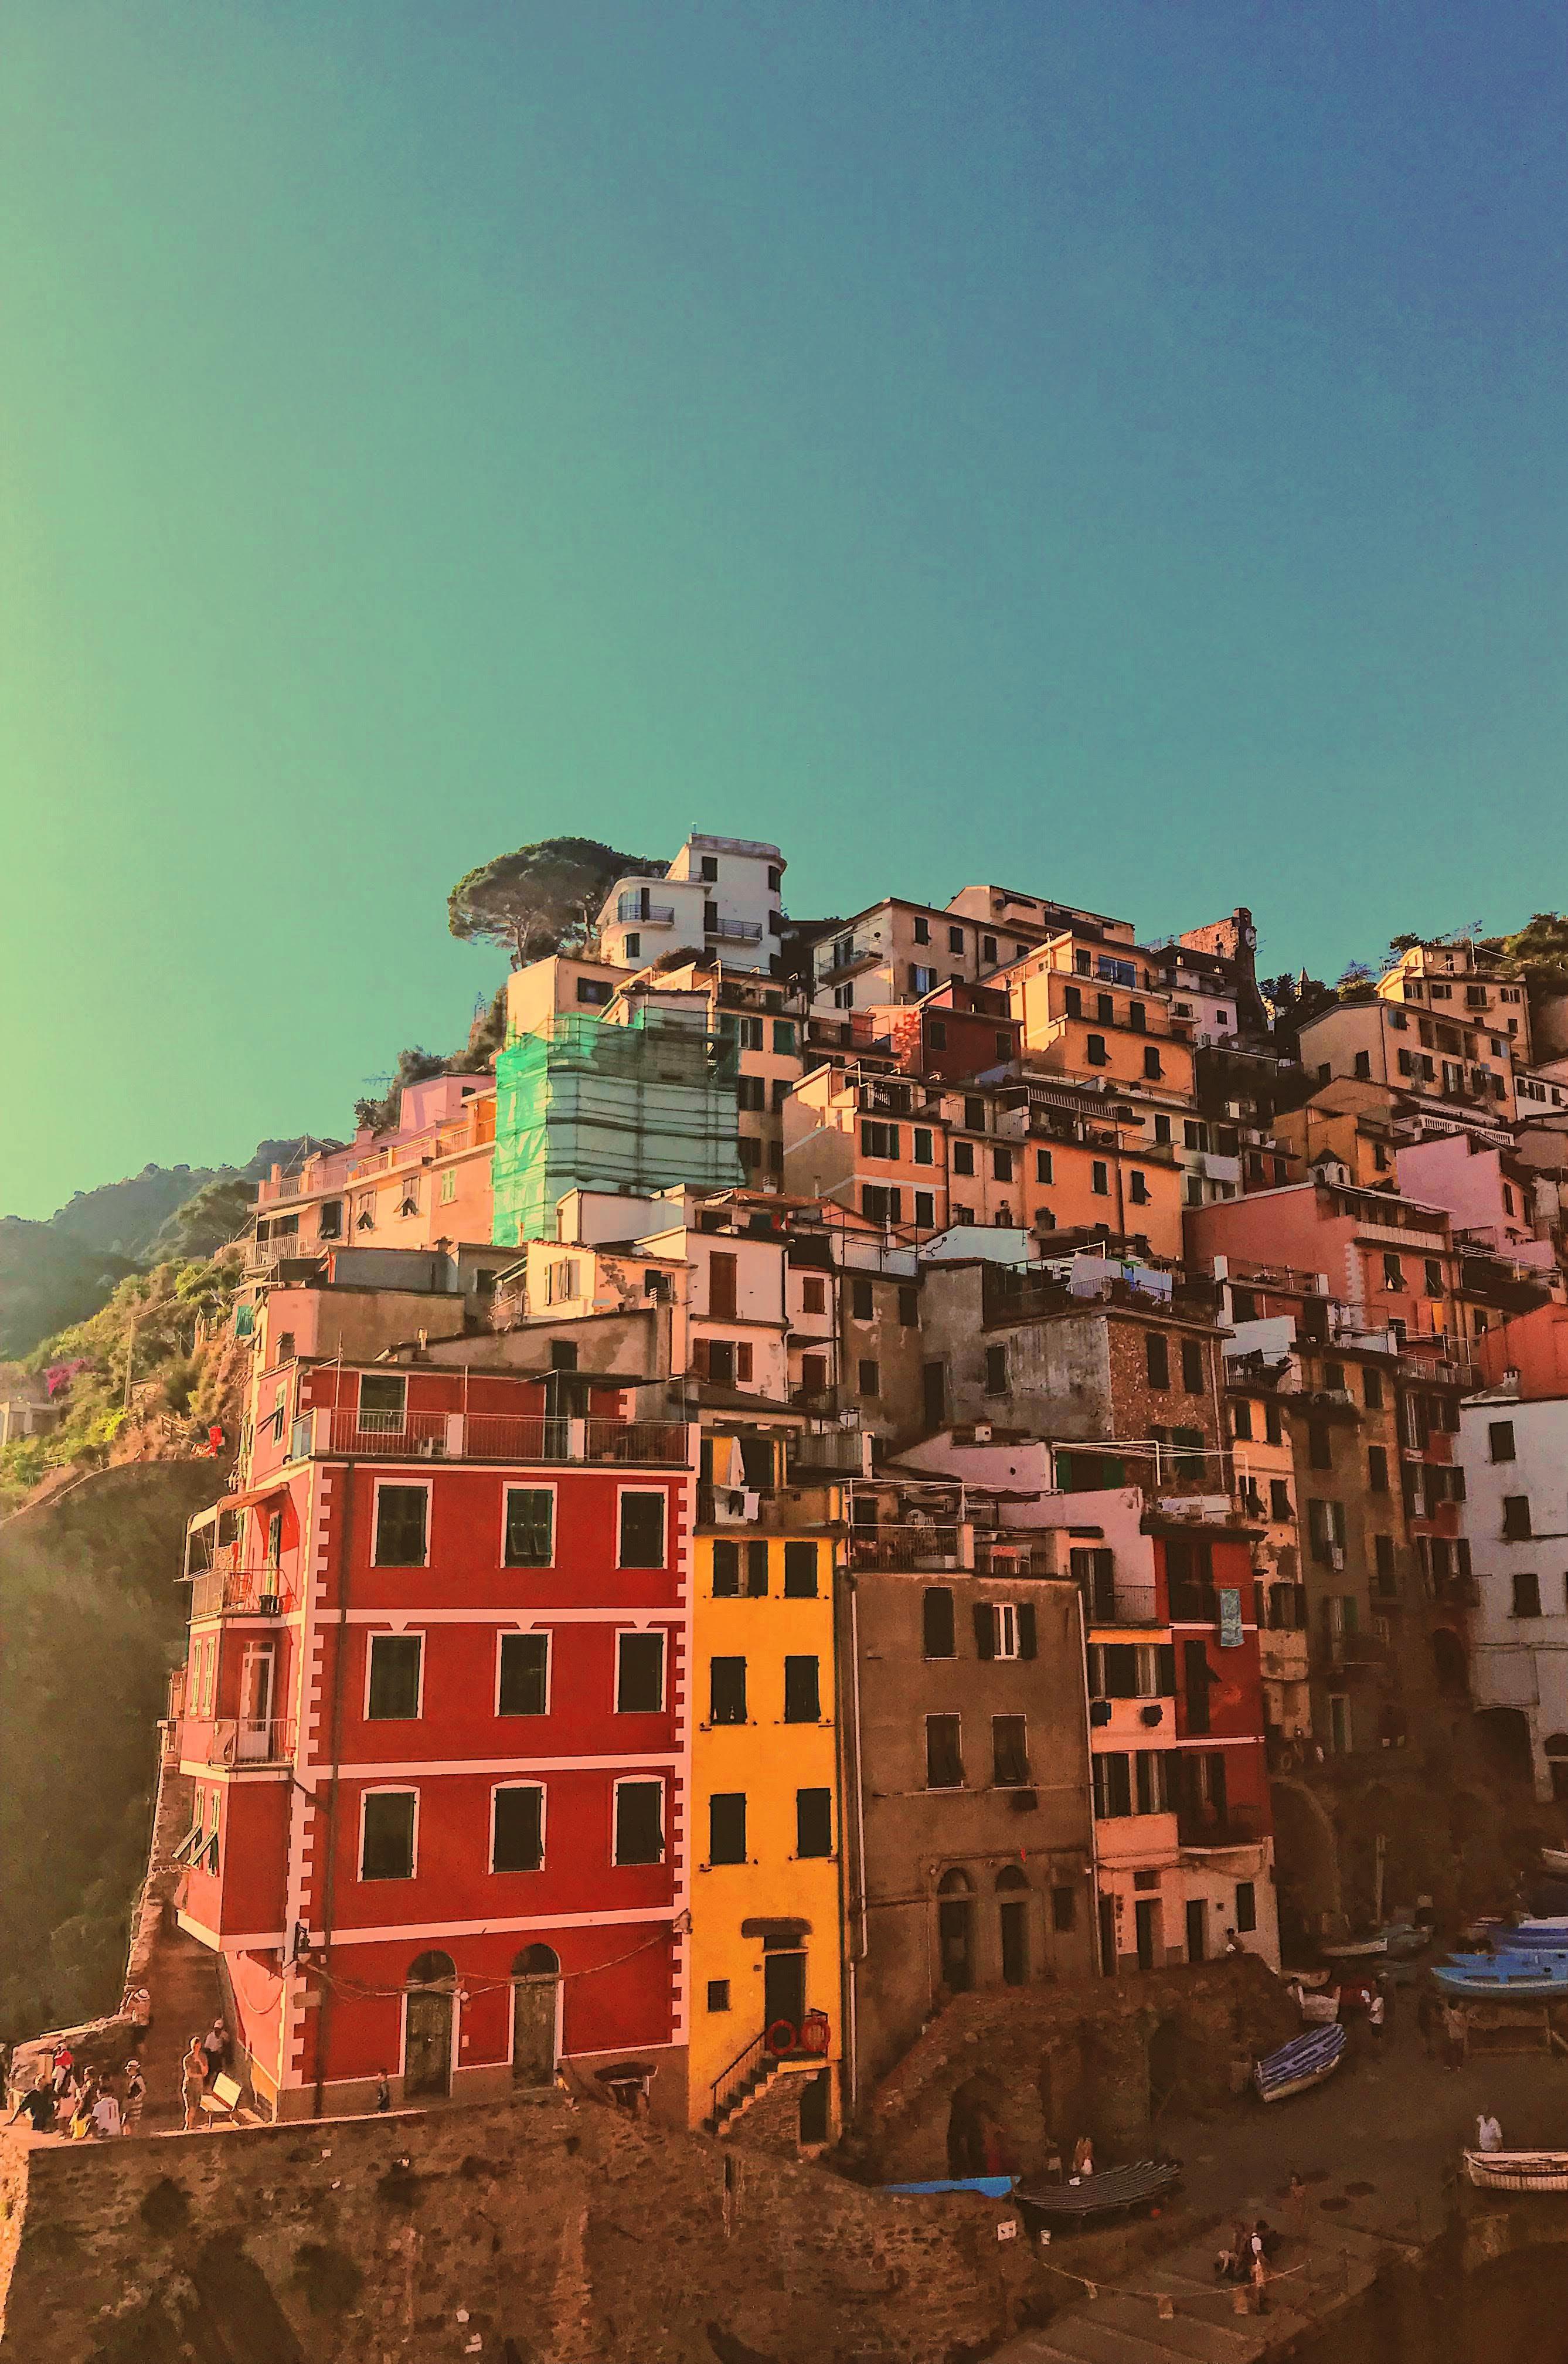 Free stock photo of sky, buildings, house, italy